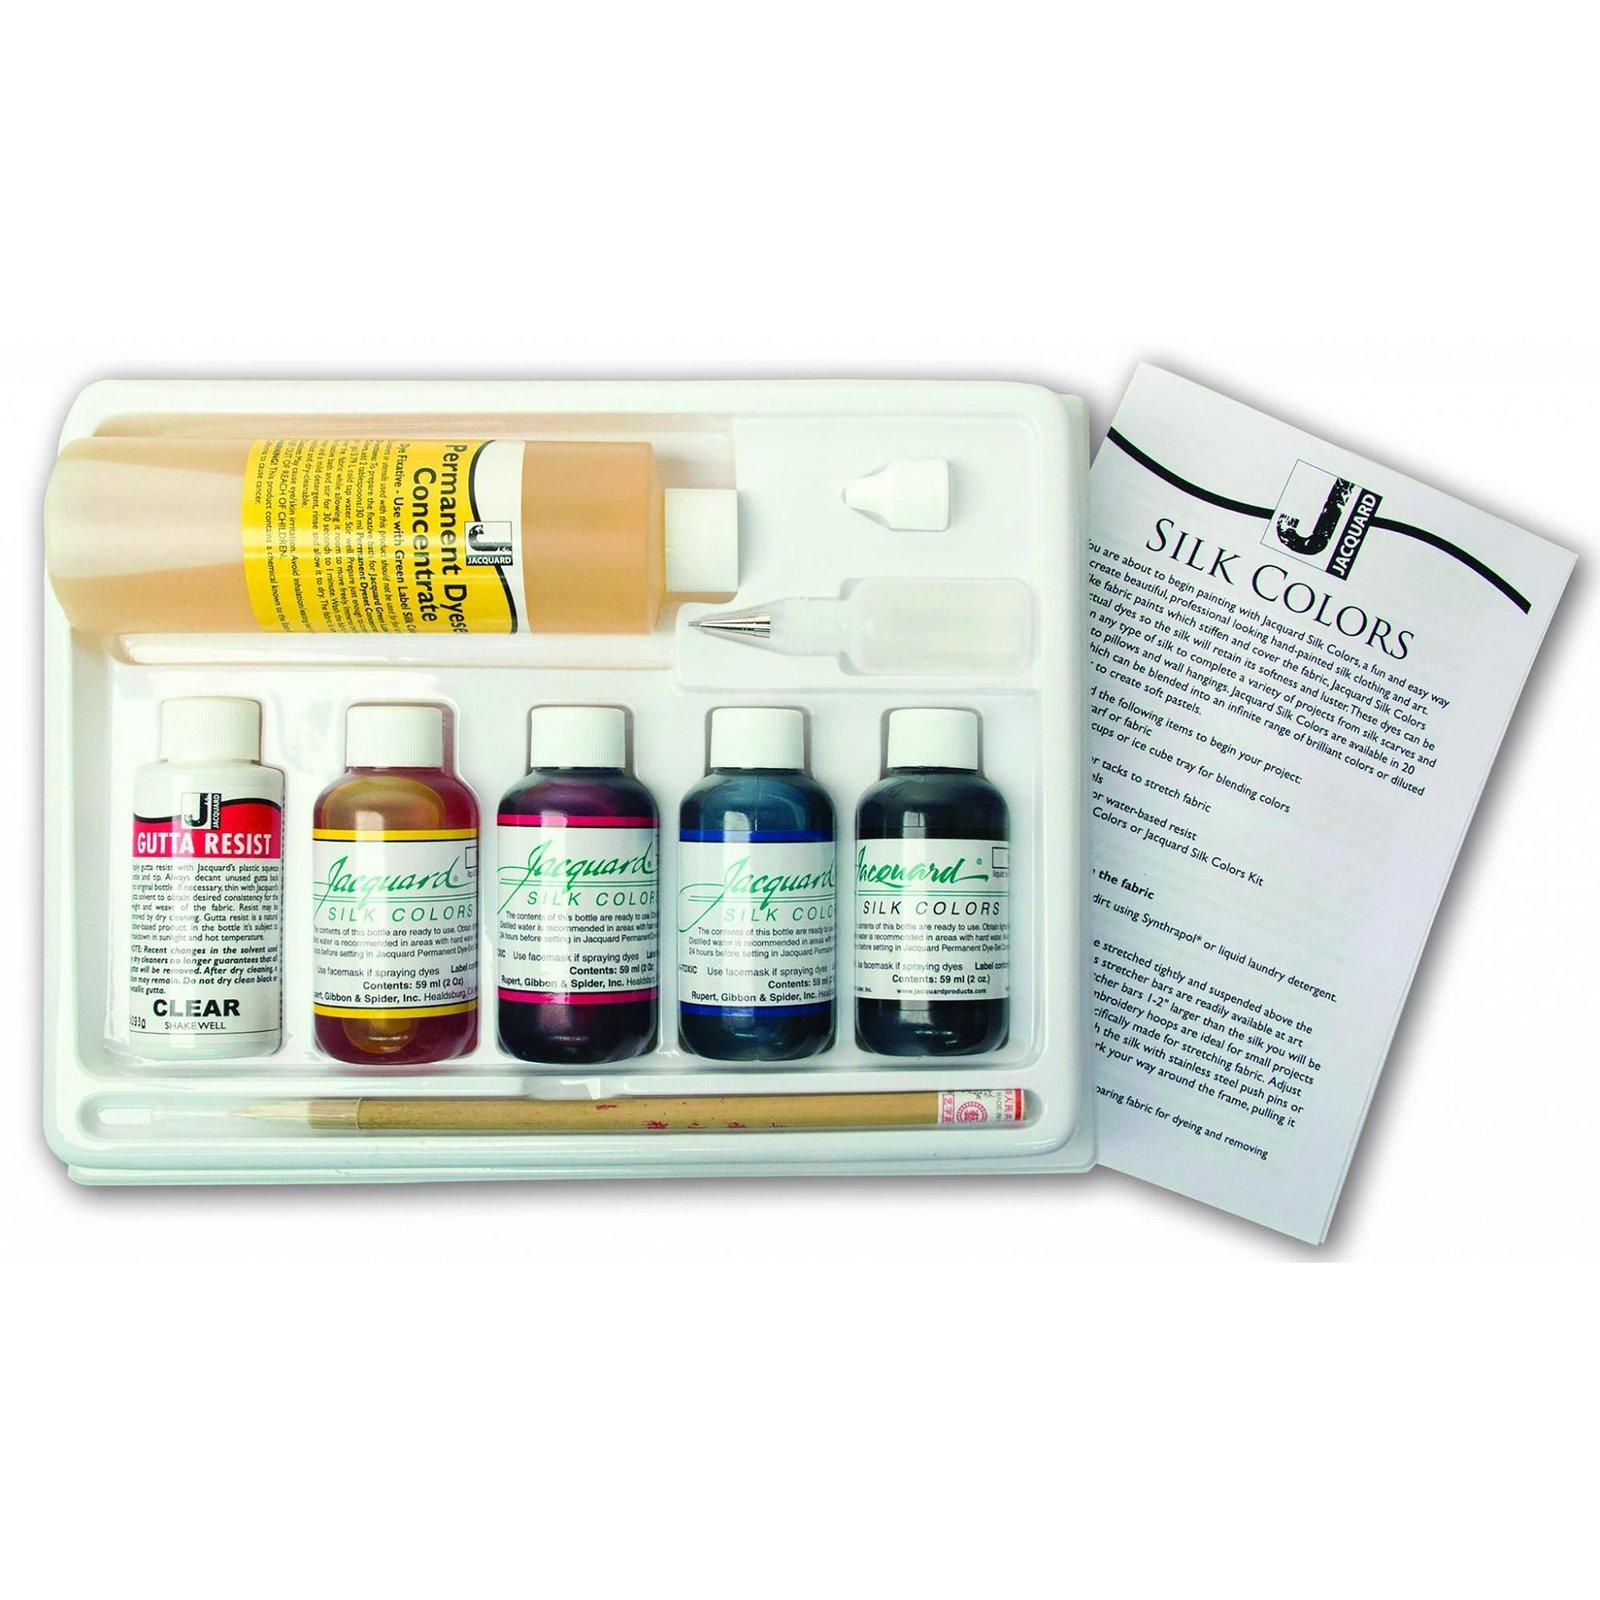 Silk Painting Colors Kit